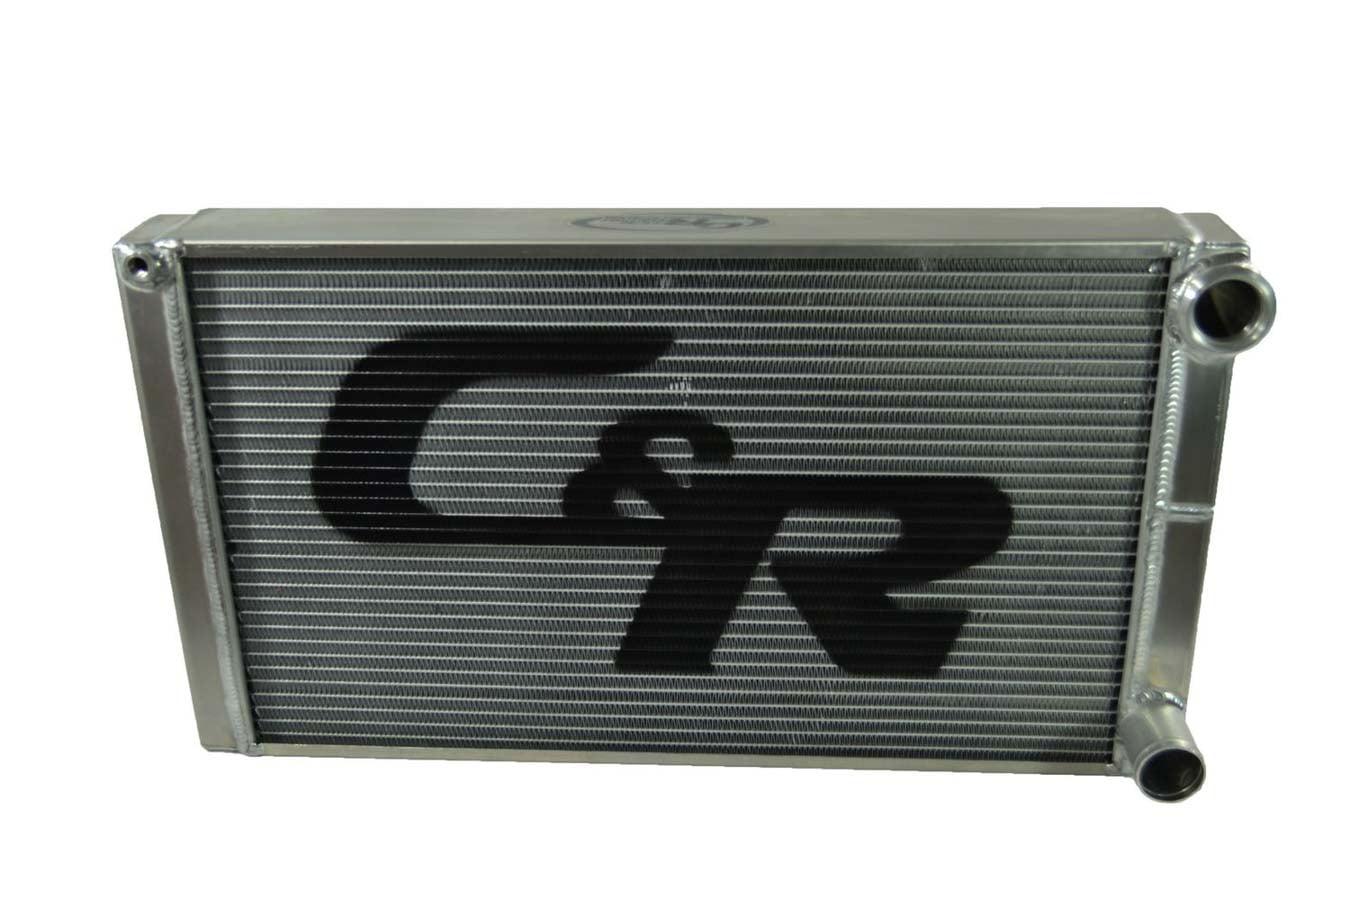 C AND R 15 in W x 28 in H x 3 in D Univ Alum Crossflow Radiator P N 826-15288 by C AND R Racing RADIATORS